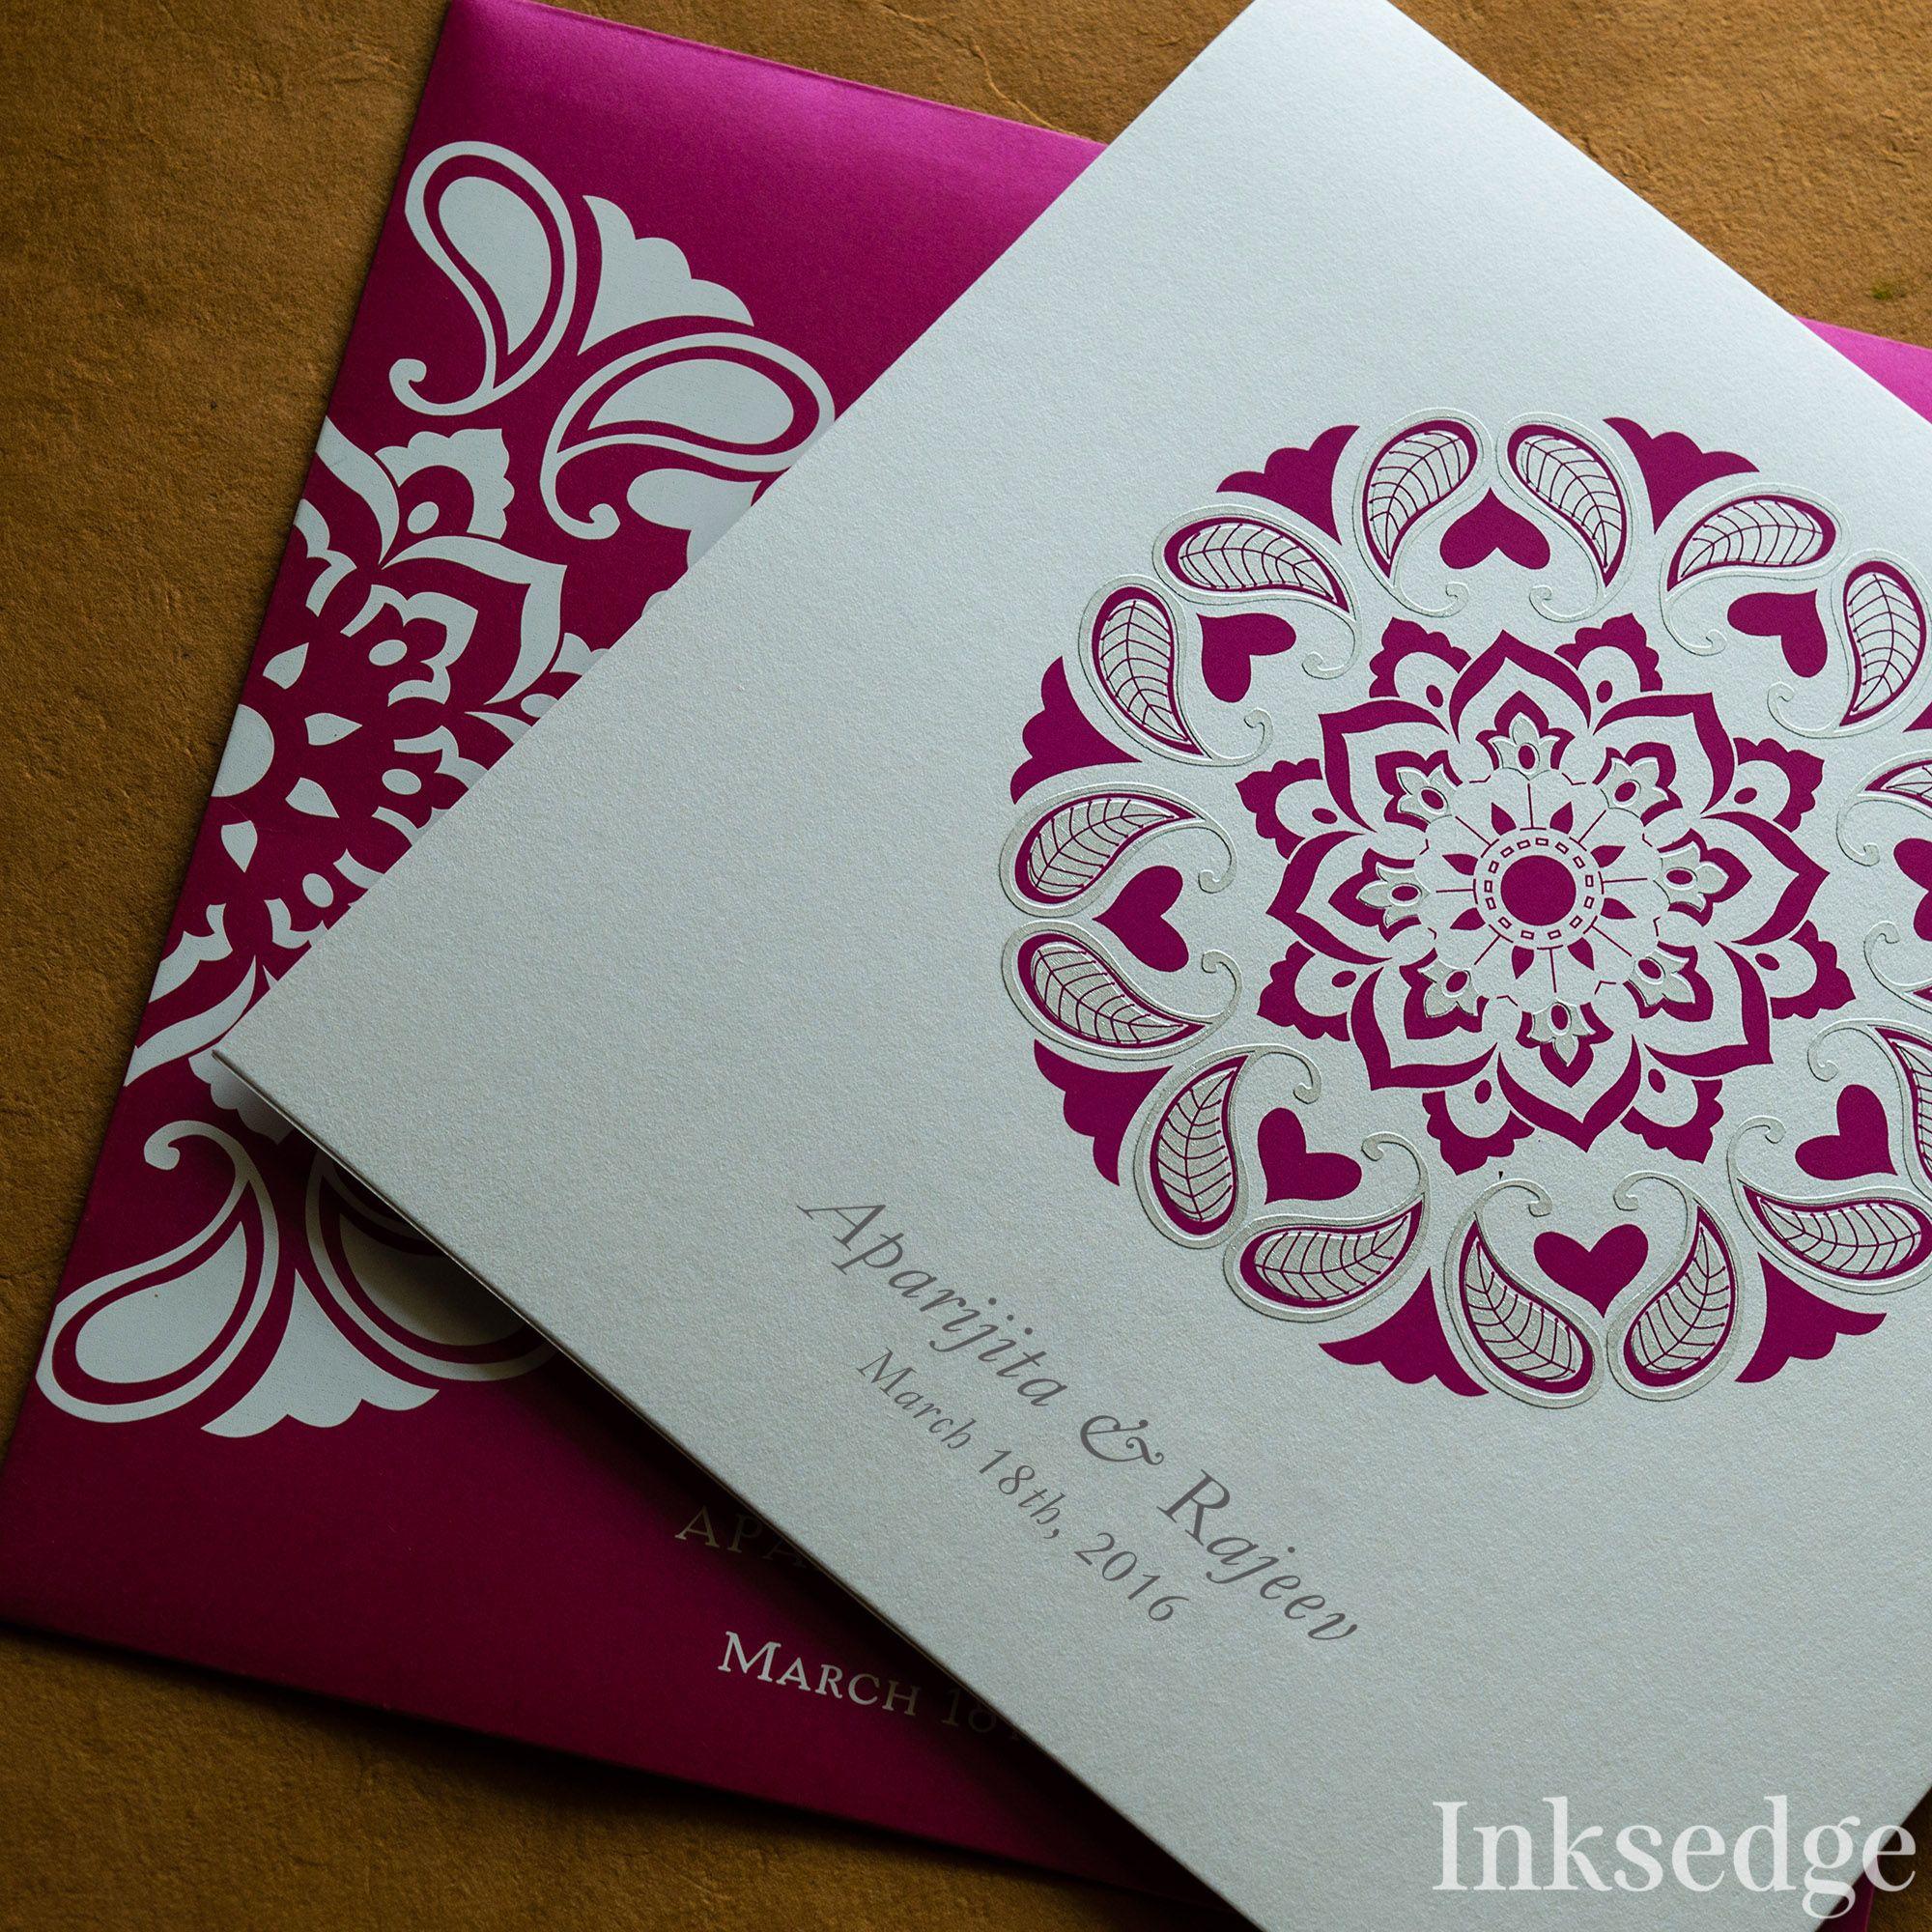 Regal Carousel Premium Screen Printed Wedding Invitation Card Design Designer Cards Inksedge Inksedgeweddinginvitations: Screen Printed Wedding Invitations At Websimilar.org